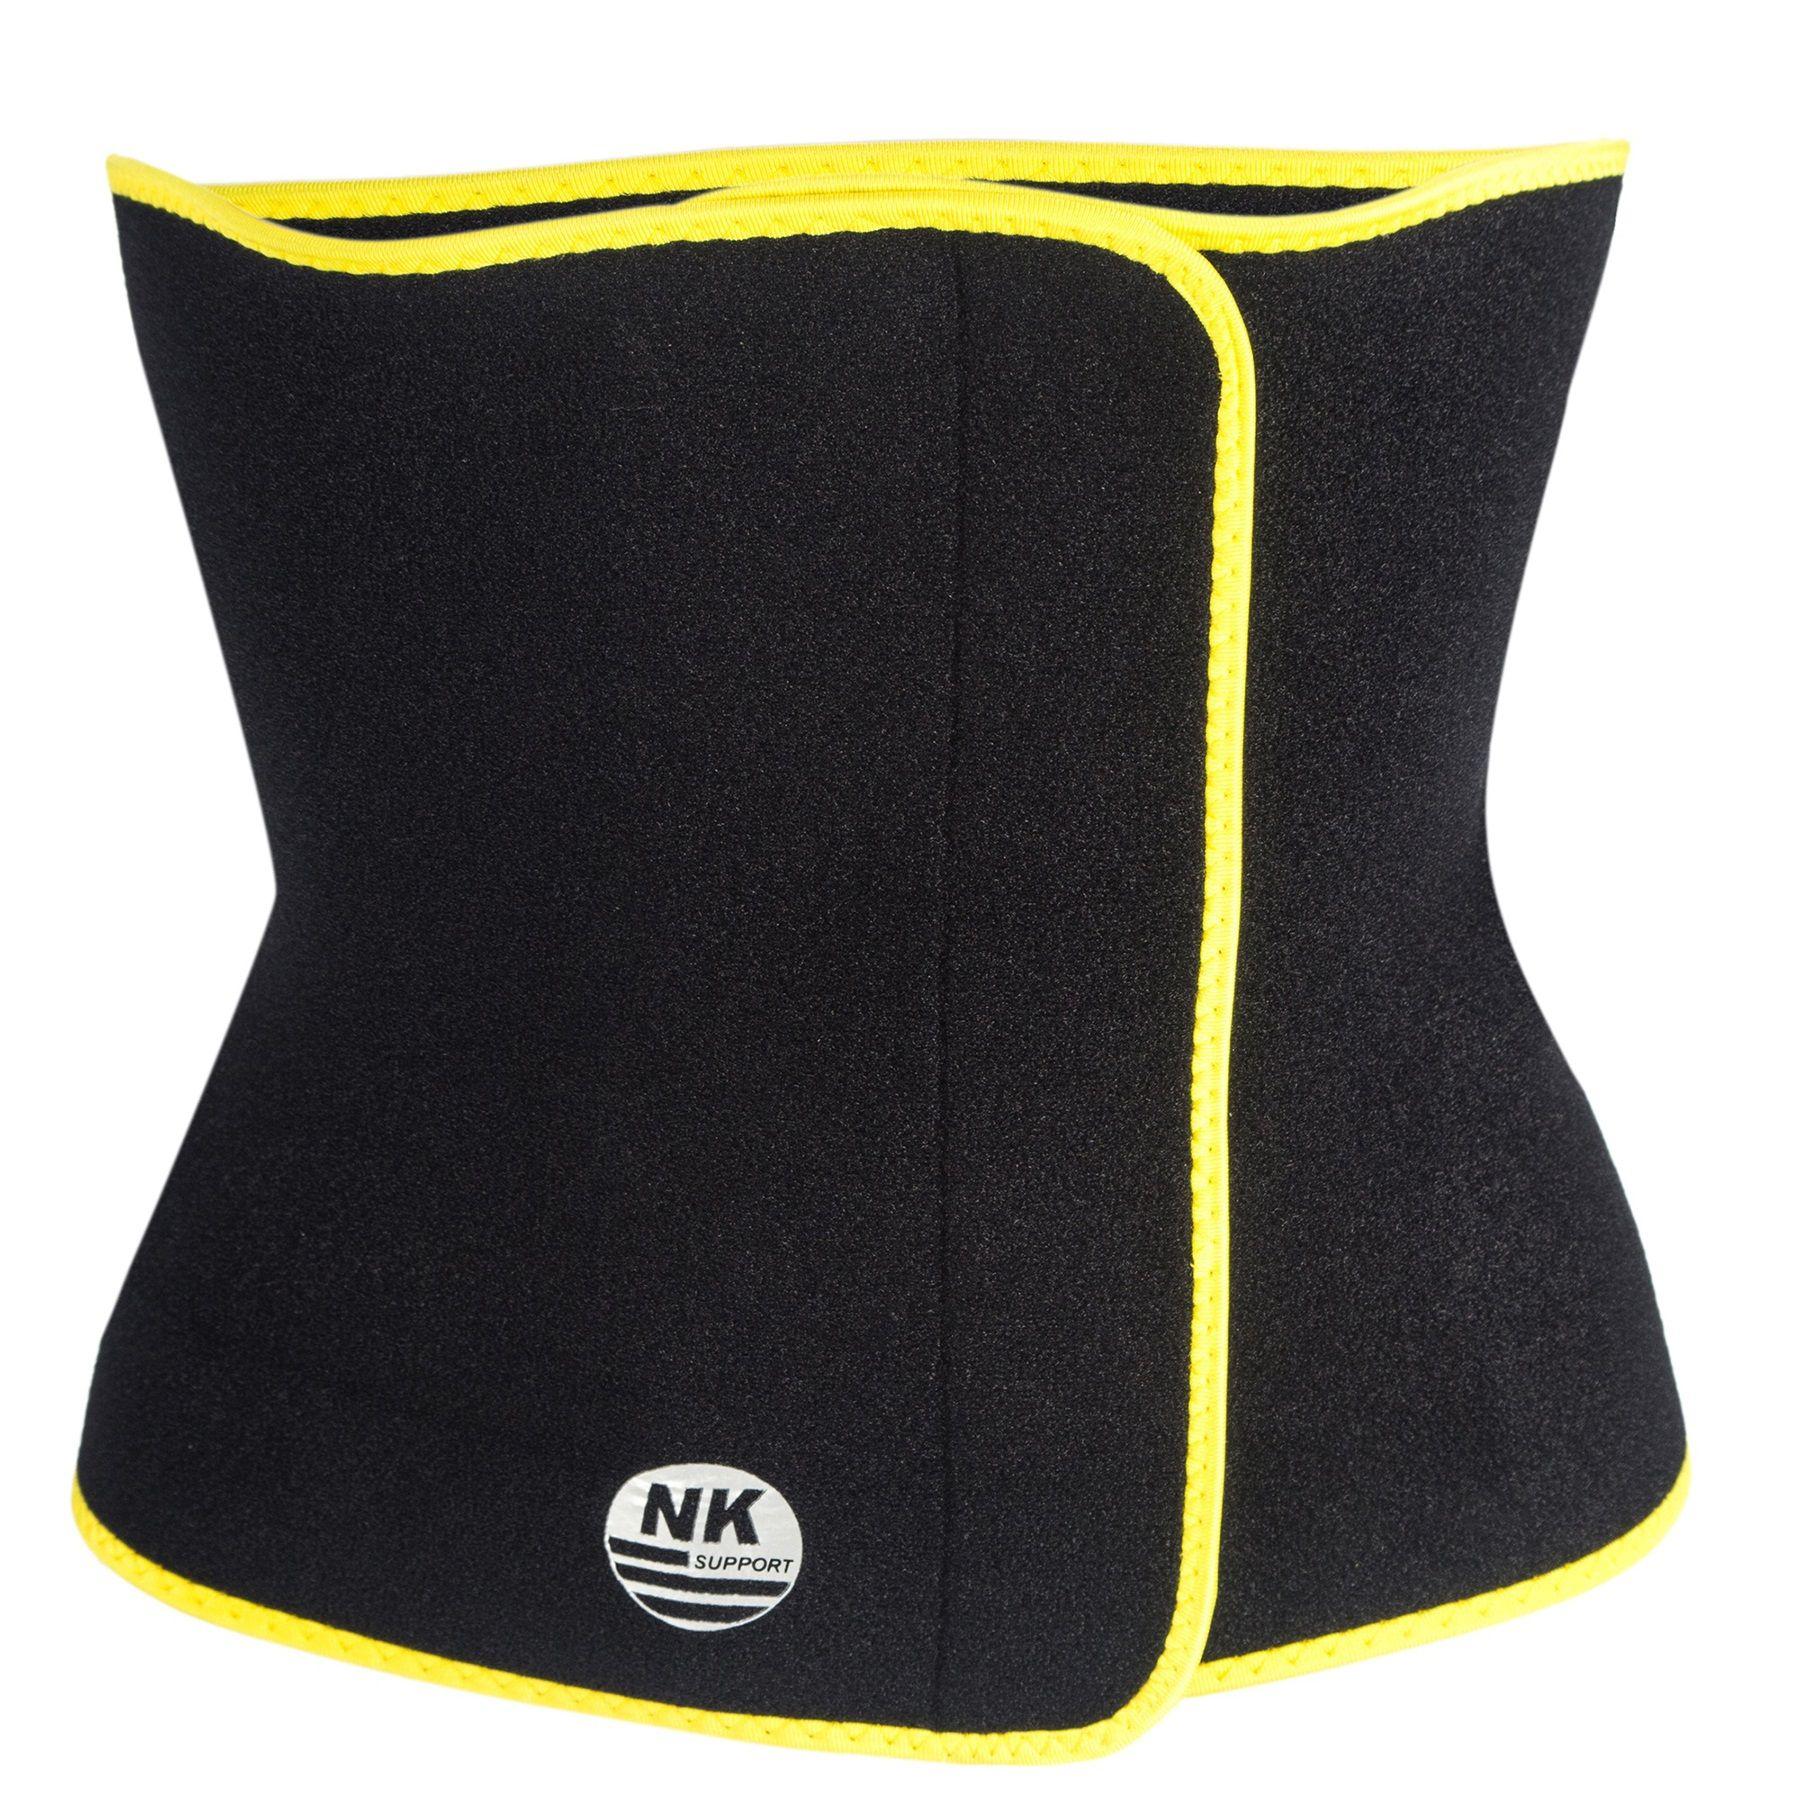 2aad95768 Women s Body Shaper Corset Hot Thermo Sweat Waist Trainer Cincher Tummy  Control Slimming Belt Weight Loss Gym Shapewear Girdle Sweat